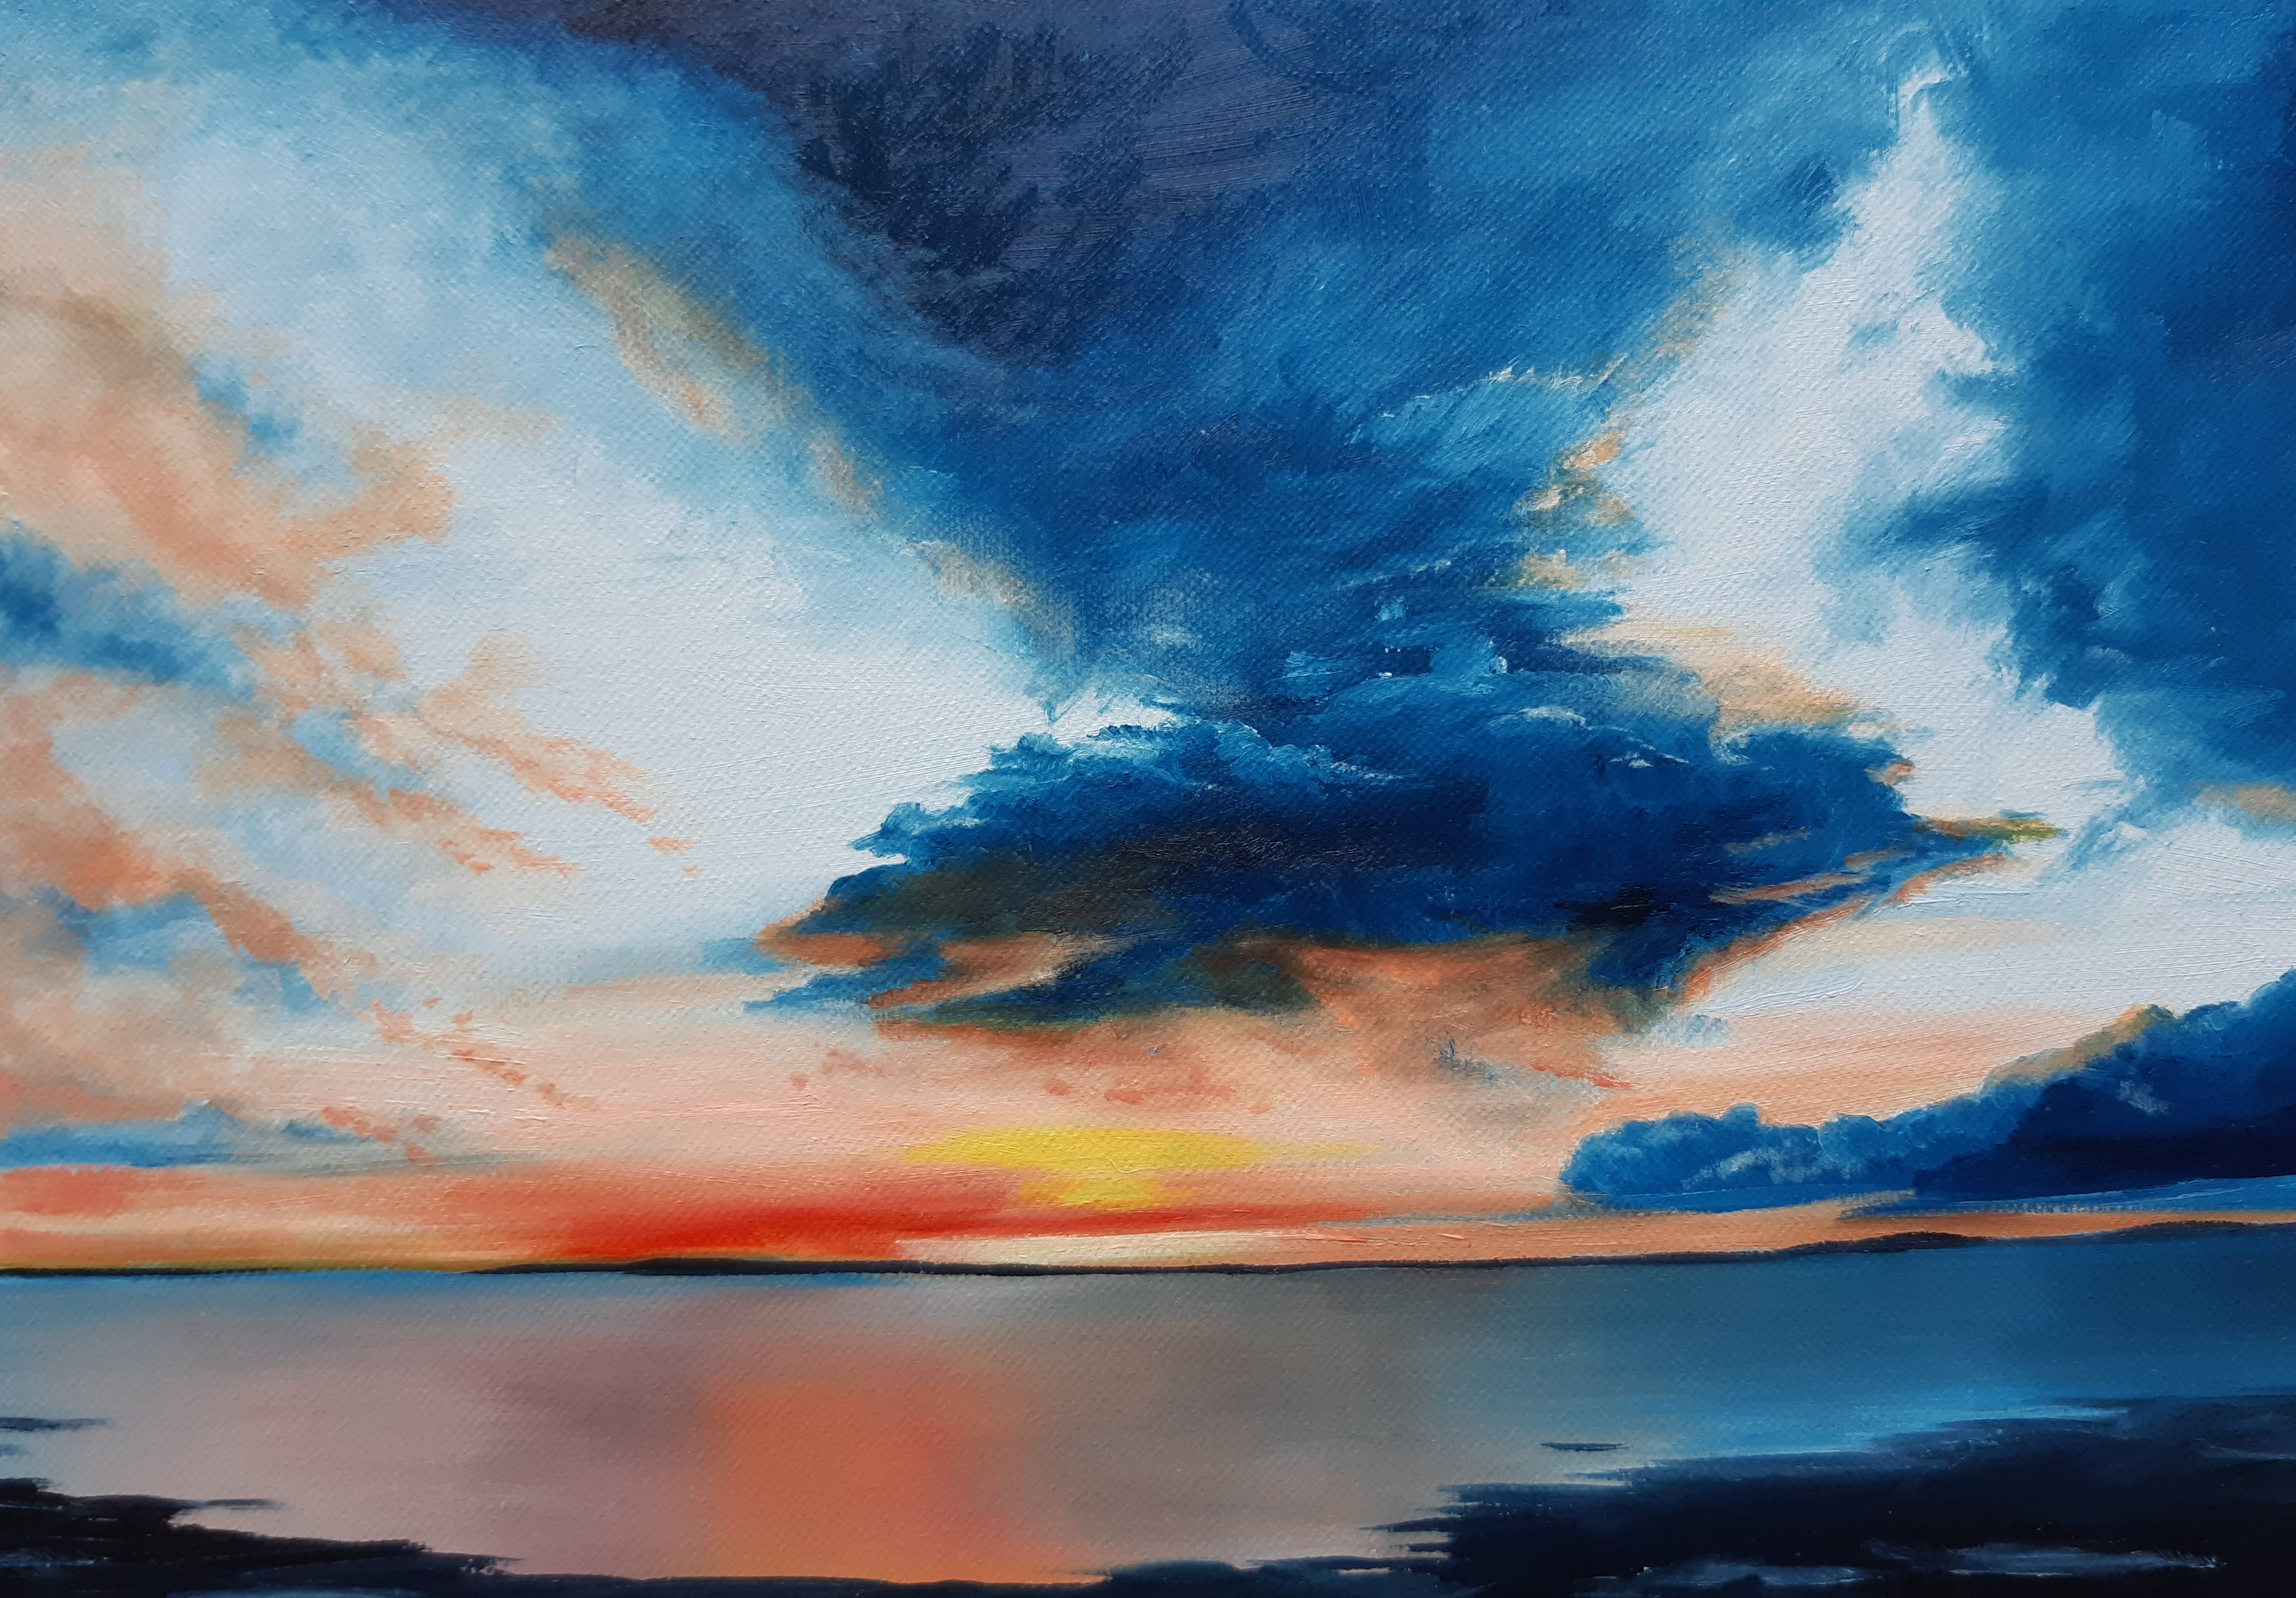 Storm Clouds, Oil, 30x20cm, 2020, by Cat